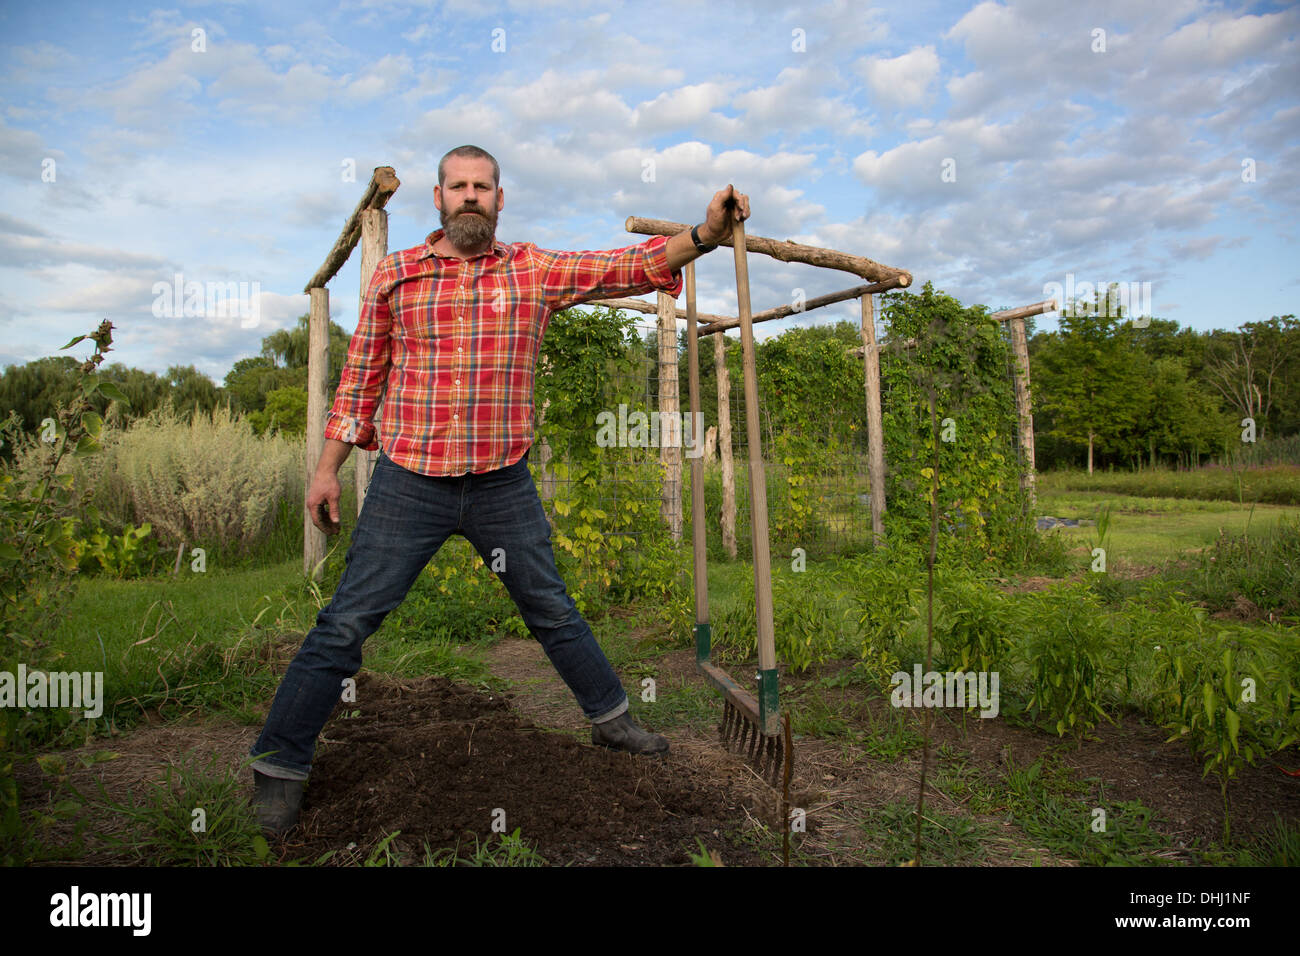 Mature man holding rake on herb farm - Stock Image